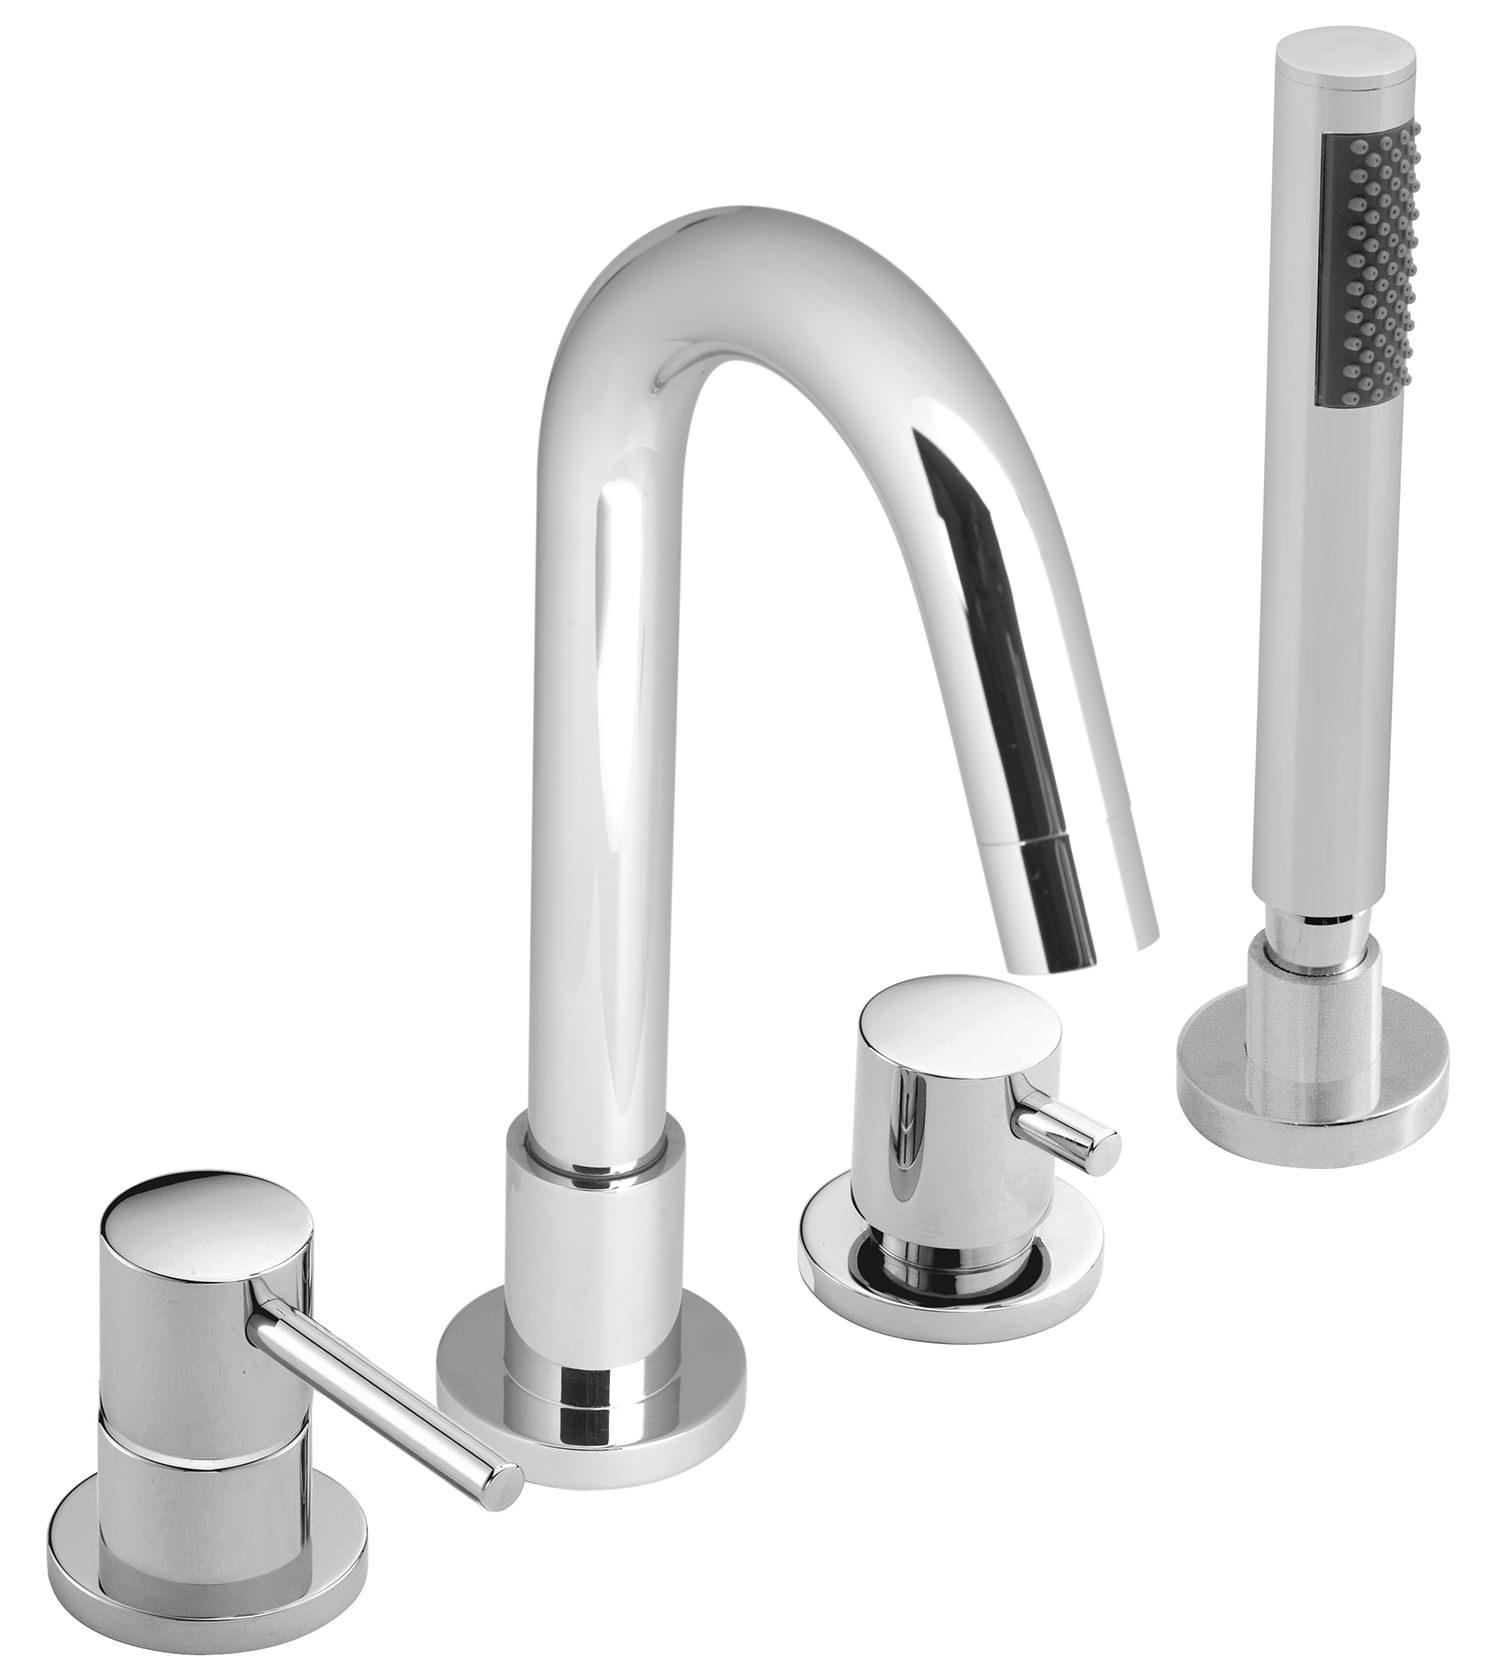 Vado Zoo 4 Hole Single Lever Bath Shower Mixer Tap ZOO-132-C/P